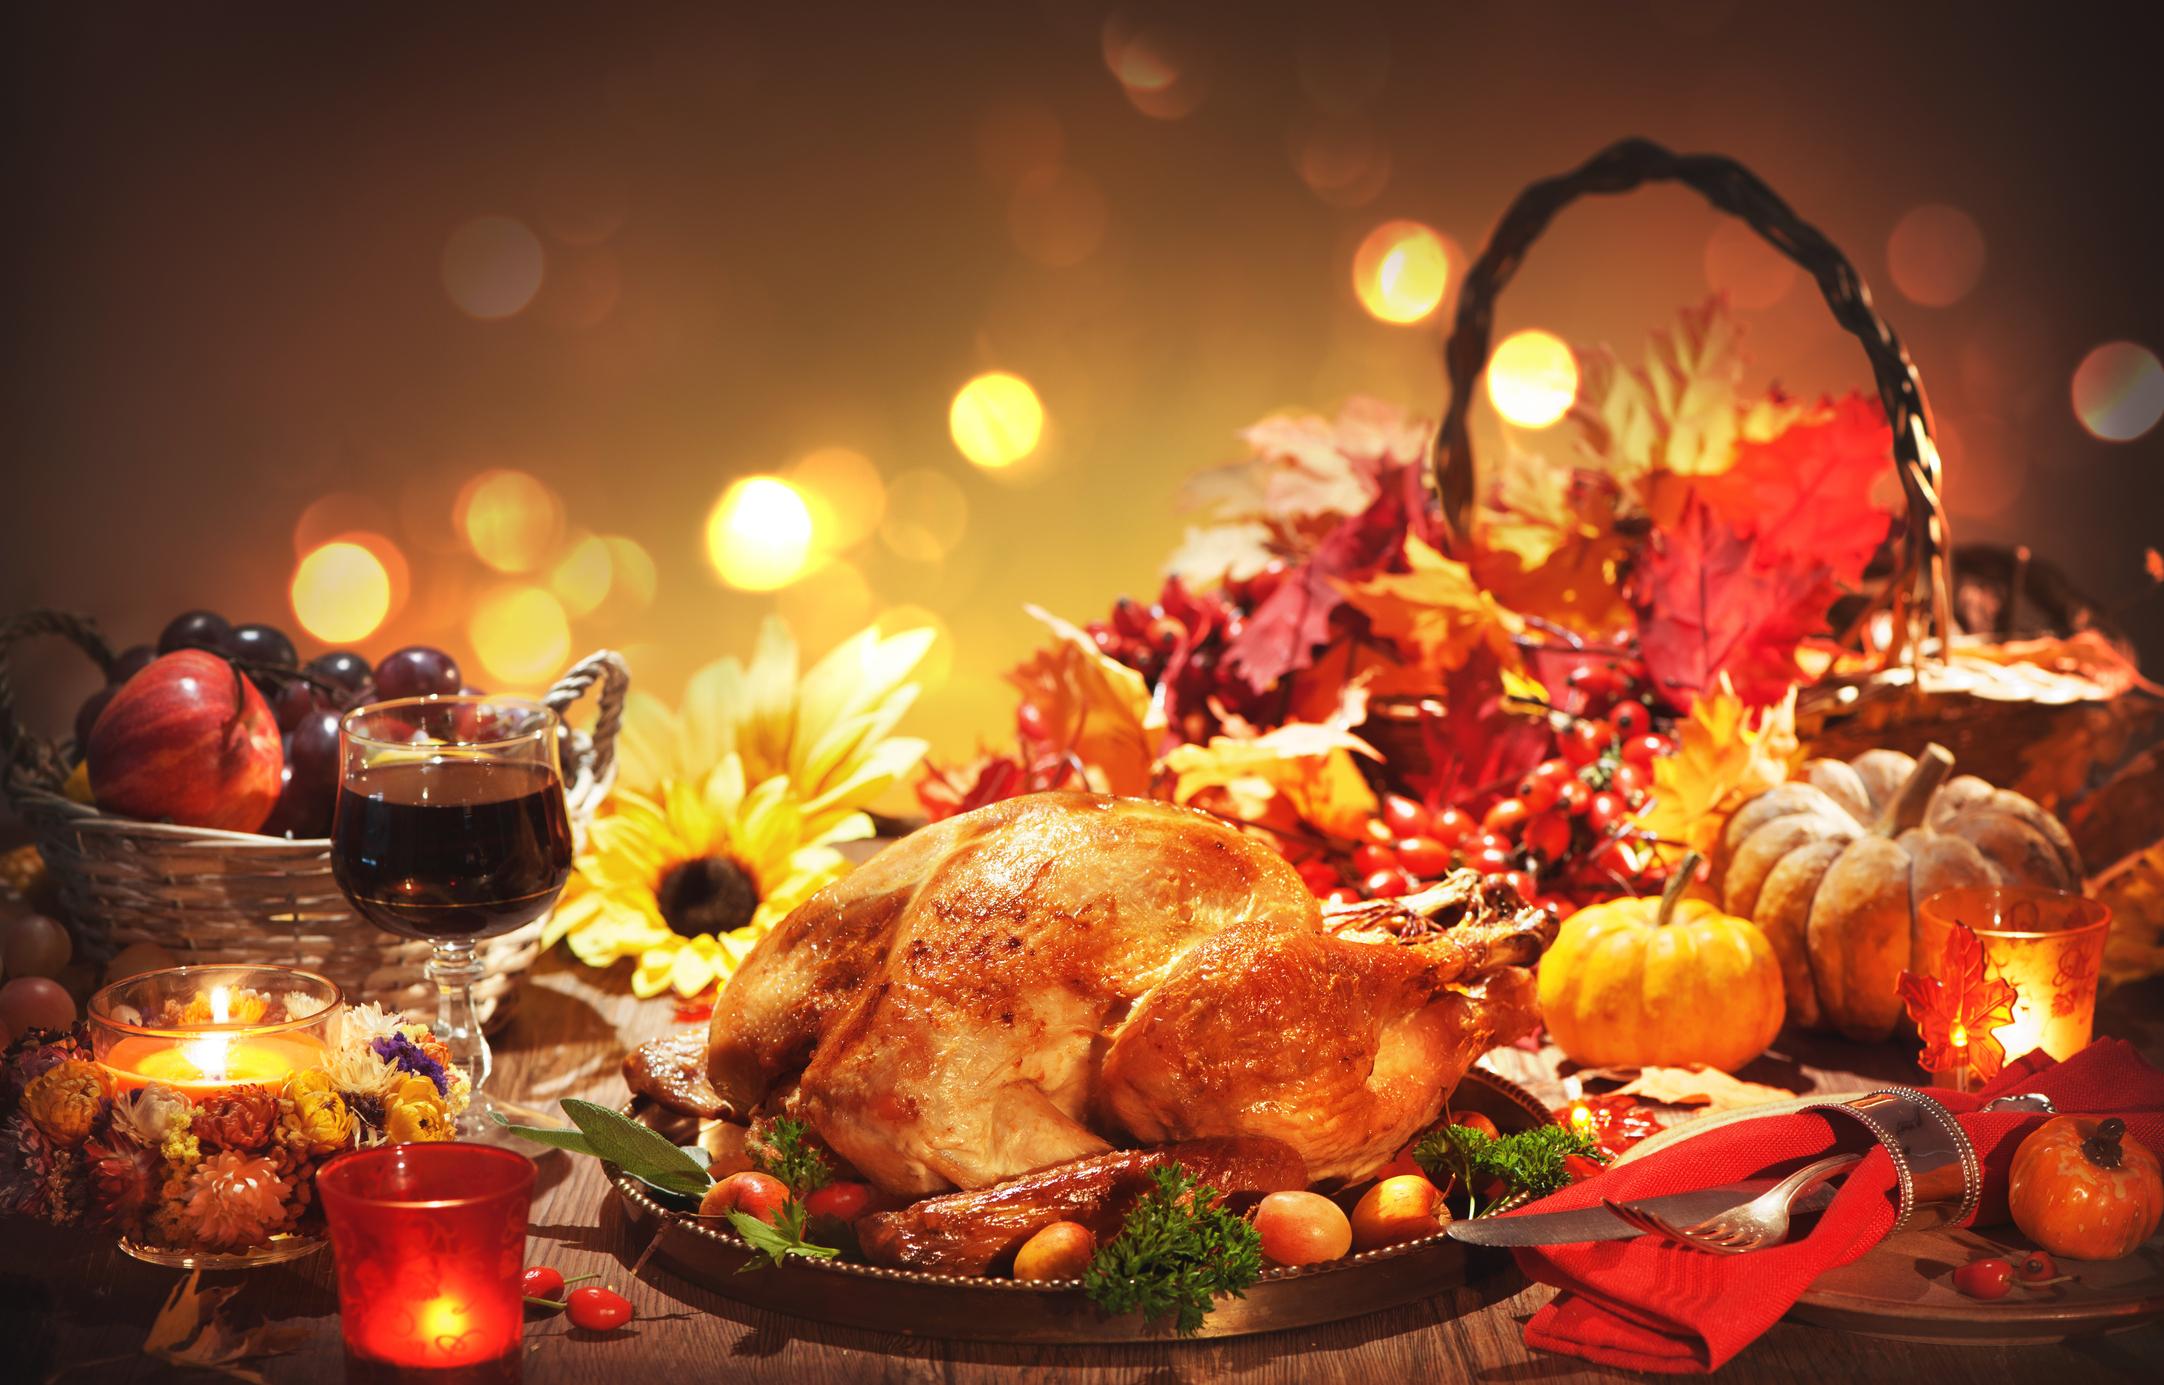 Thanksgiving food display